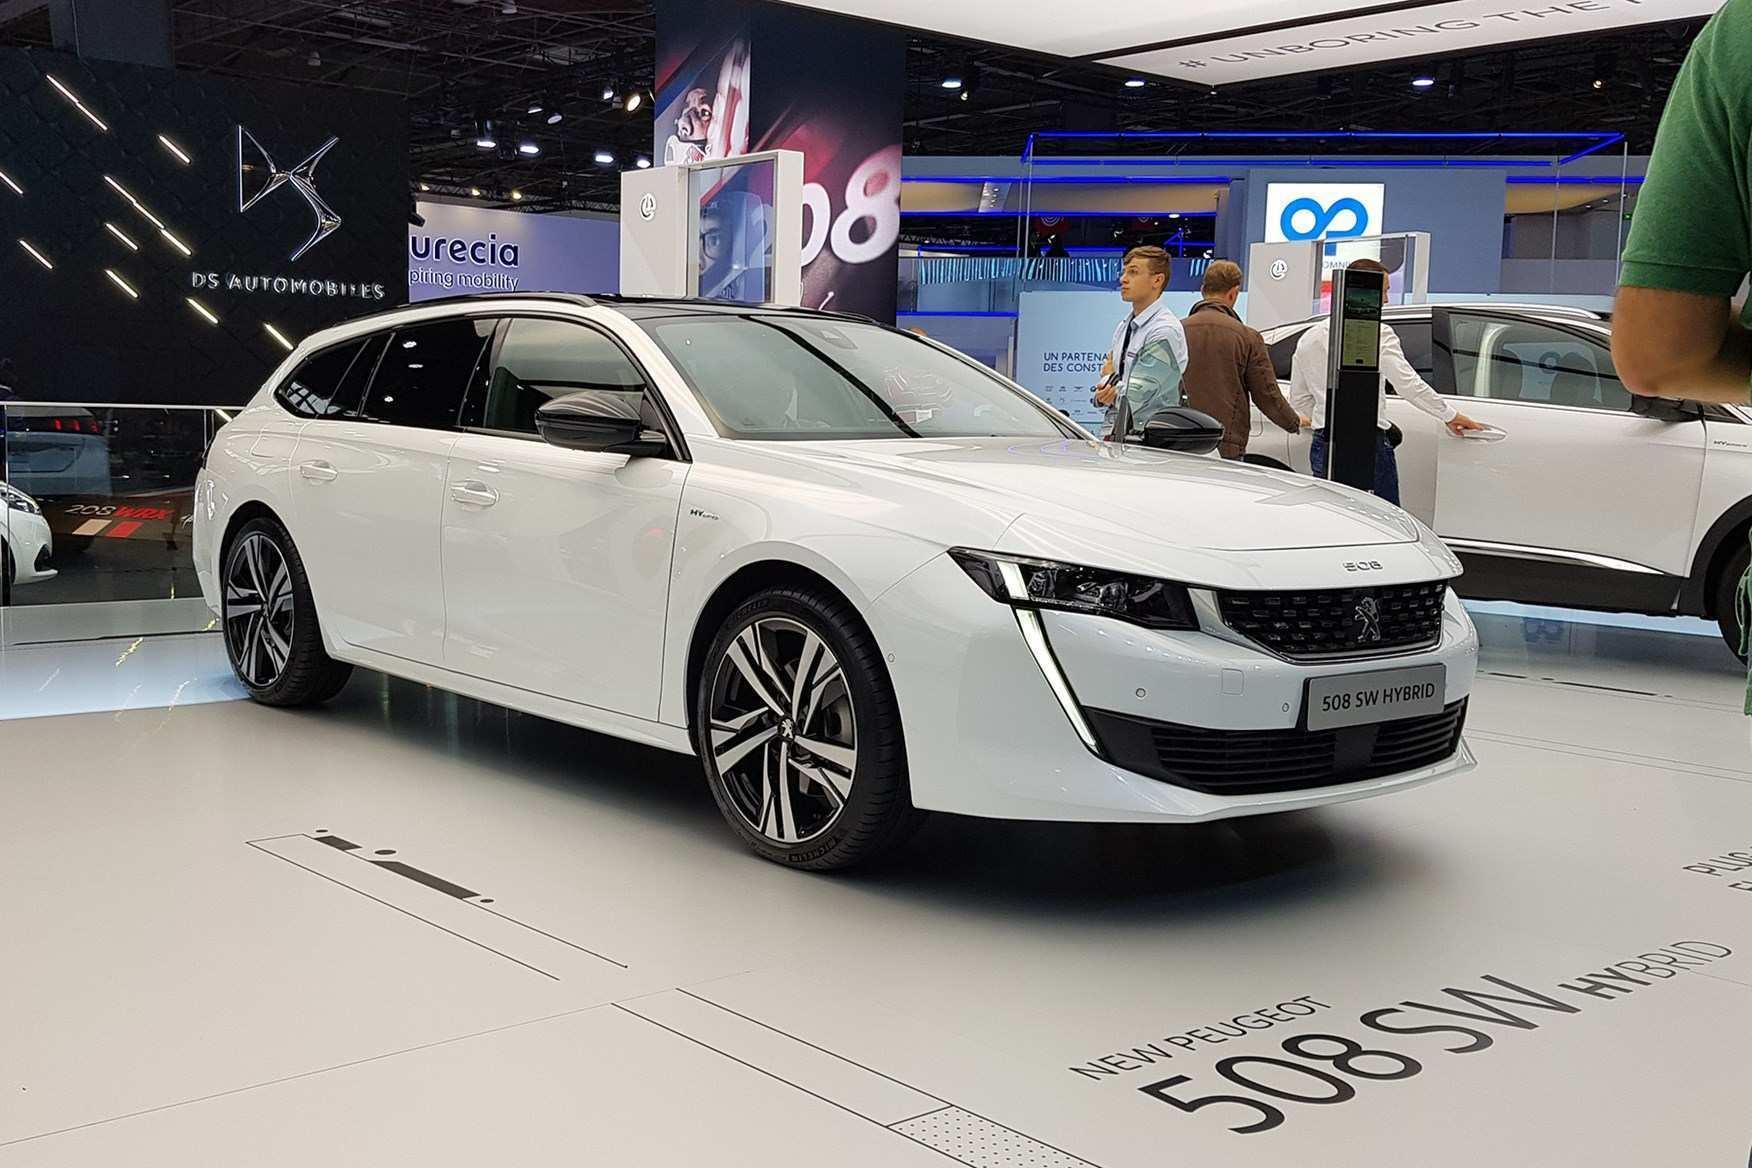 74 Gallery of Motori 2020 Peugeot Release by Motori 2020 Peugeot